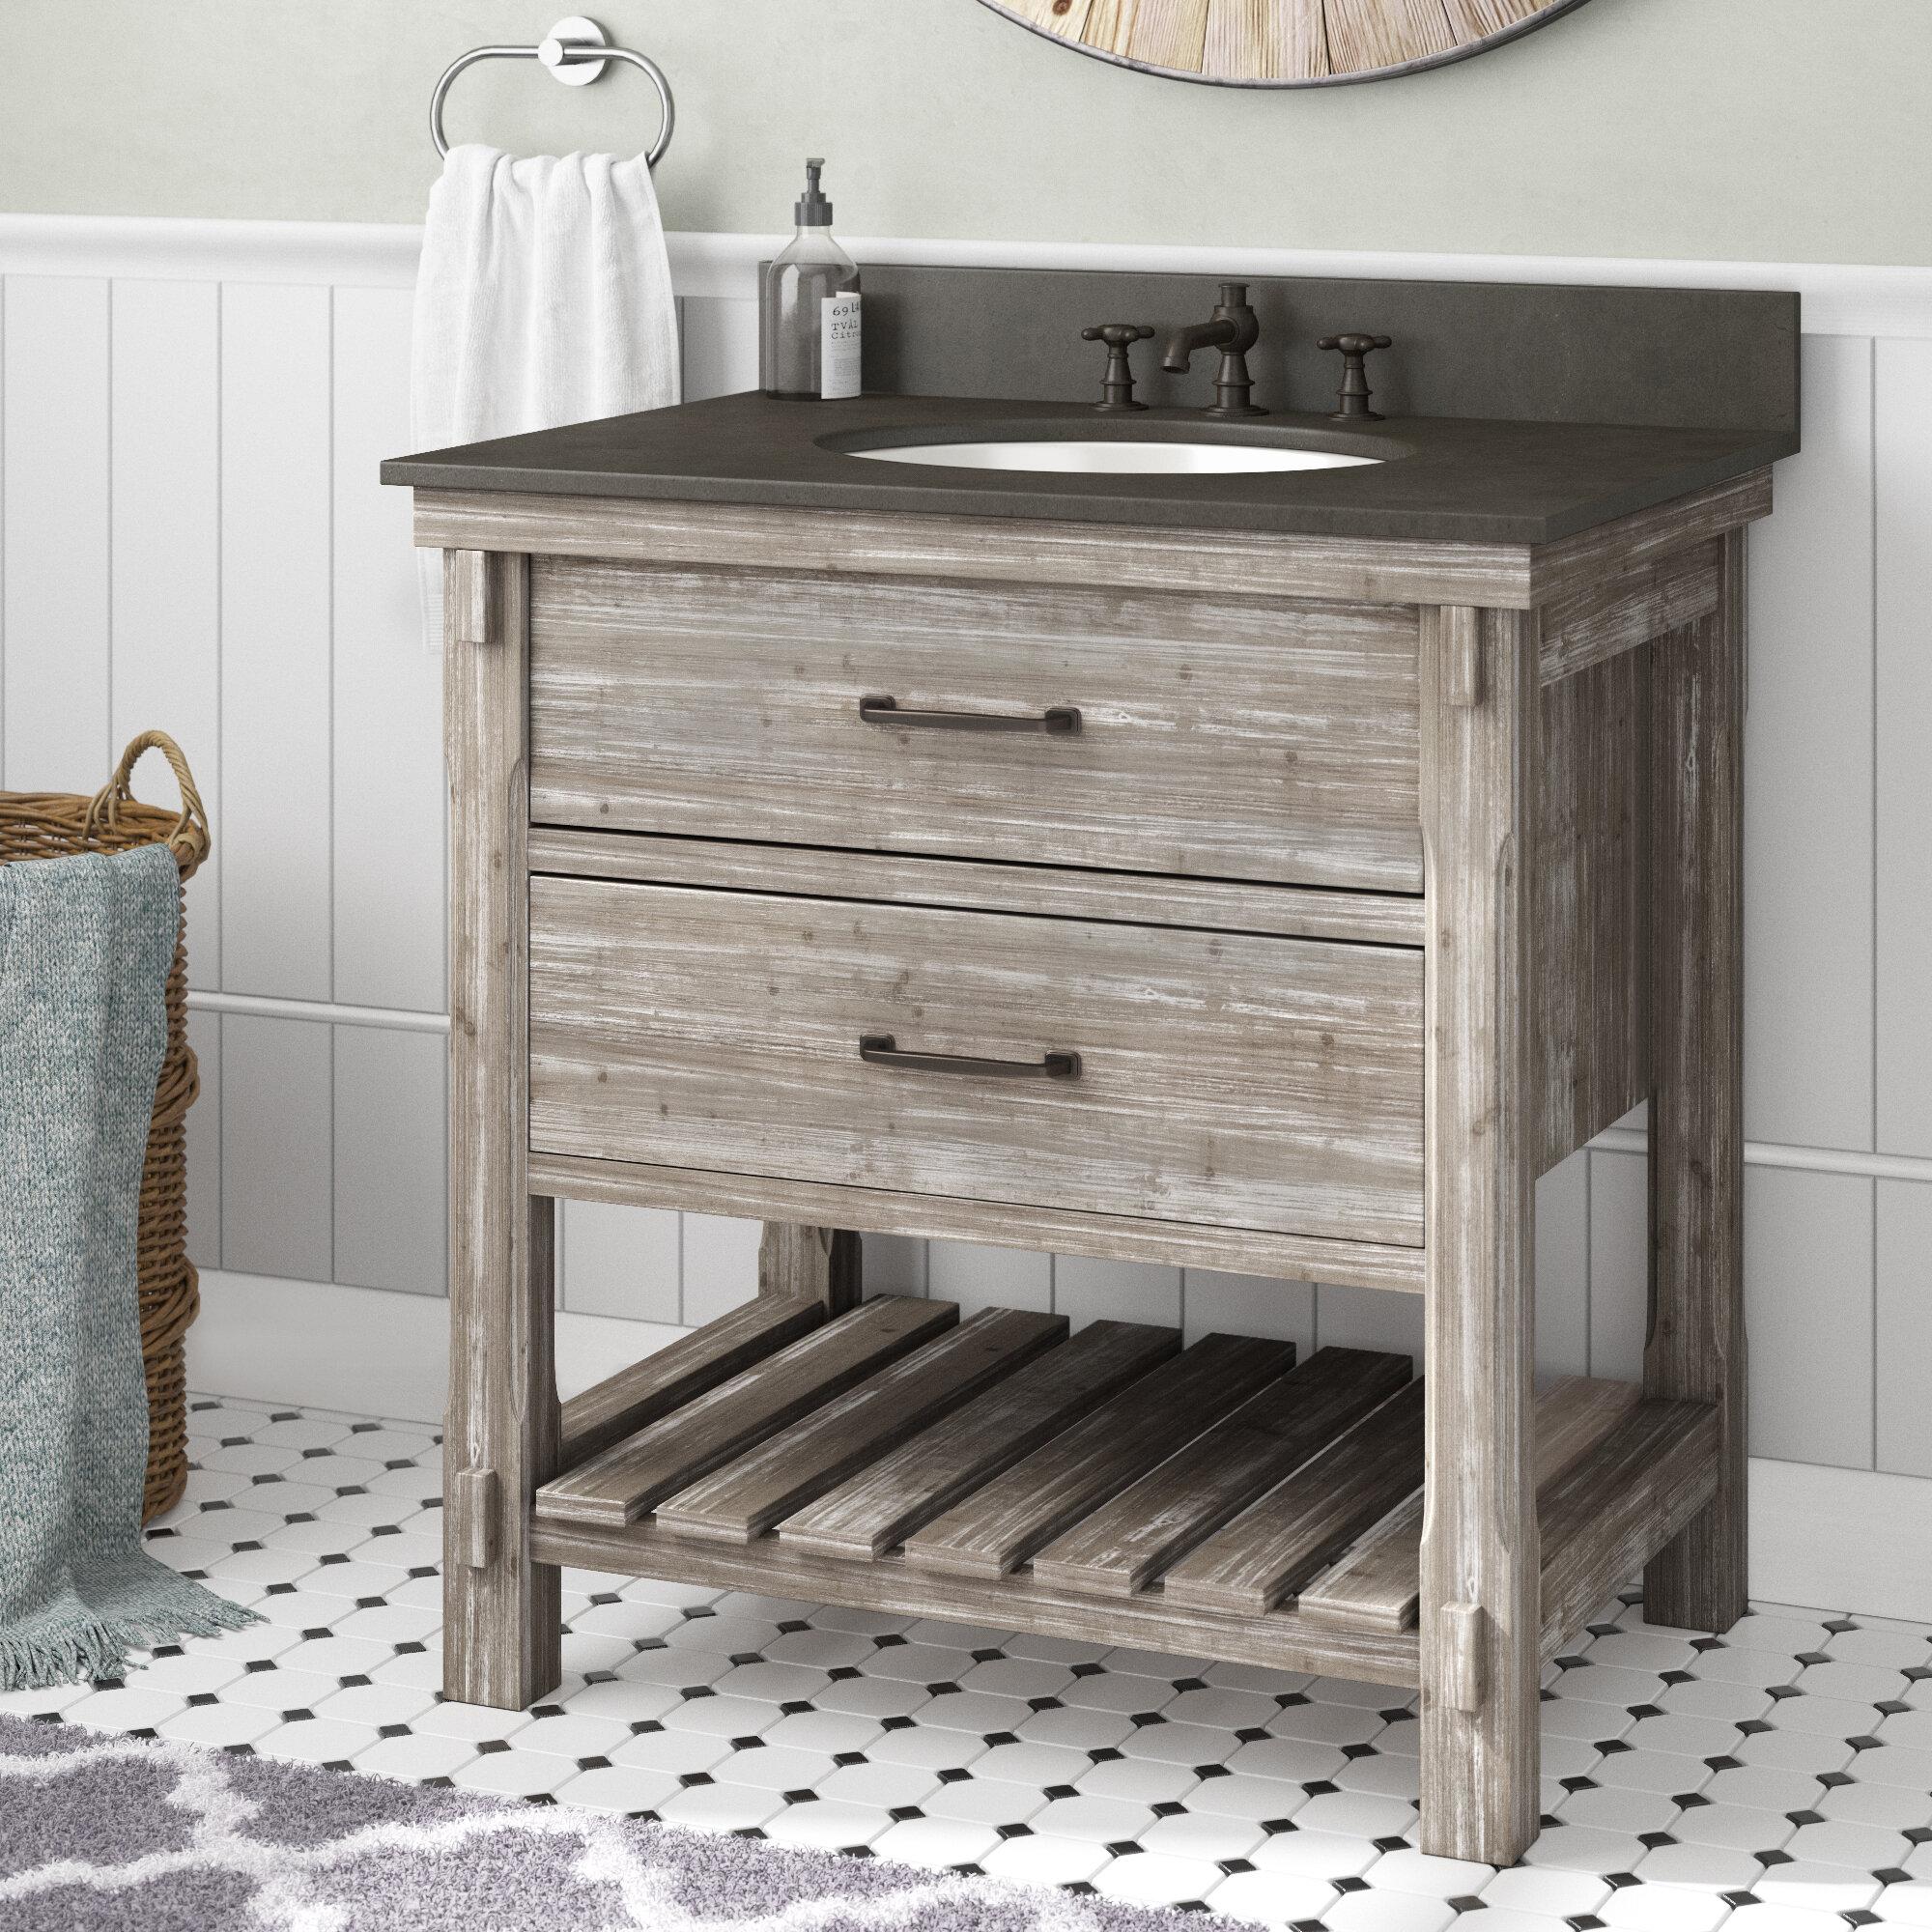 Laurel Foundry Modern Farmhouse Bathroom Vanities You Ll Love In 2021 Wayfair